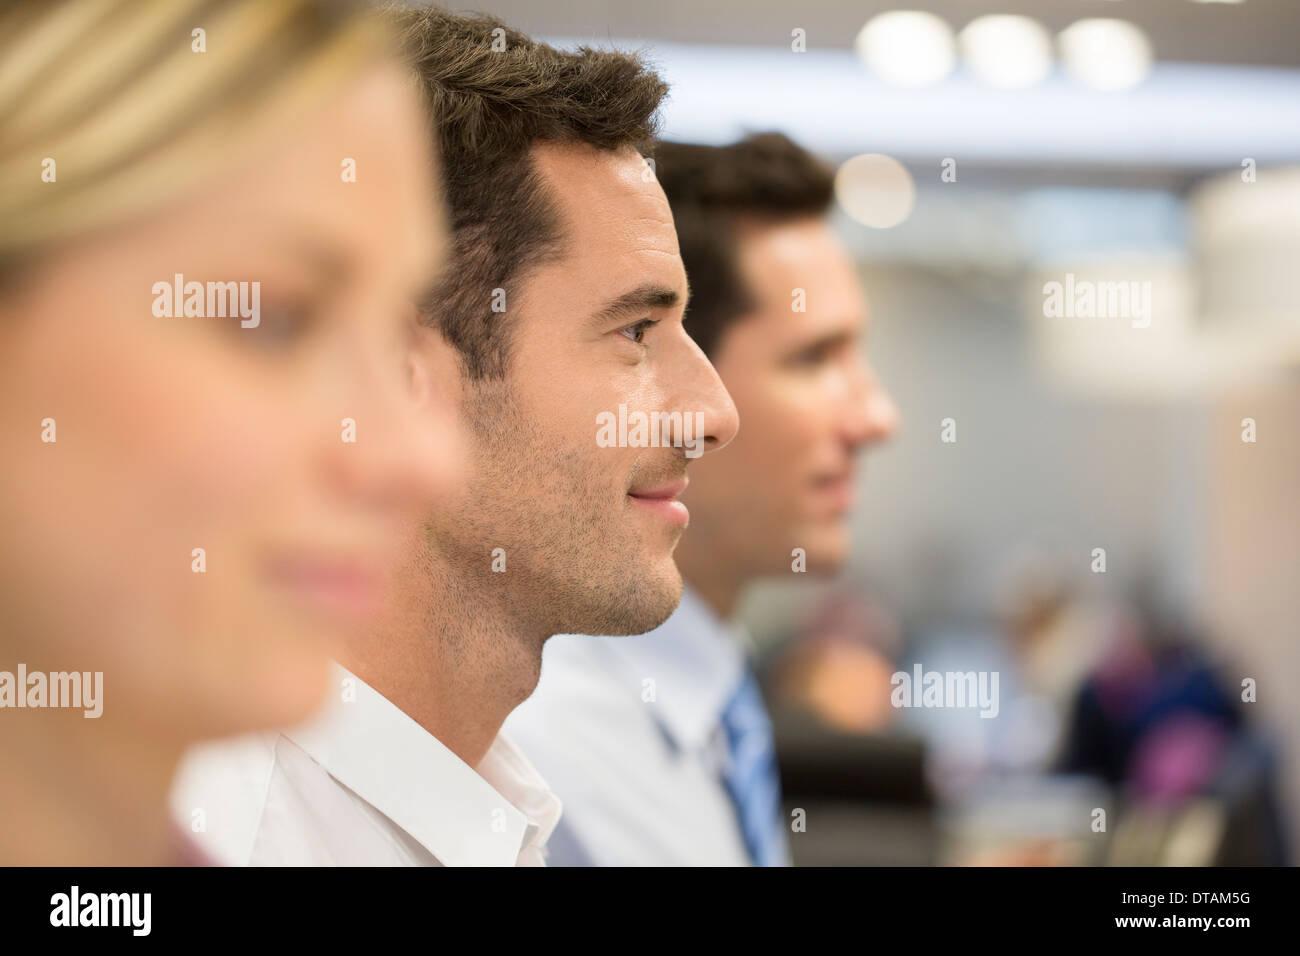 Woman men group office profile line - Stock Image